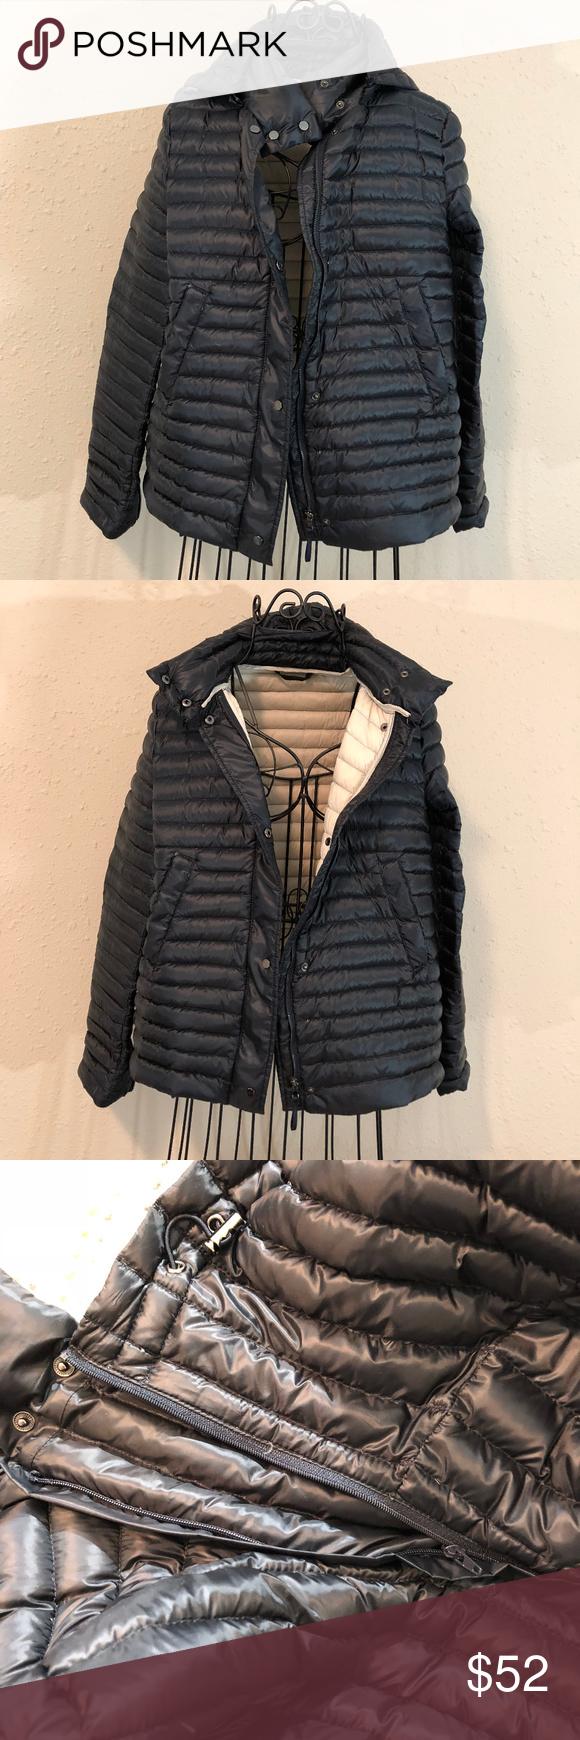 45 Zara Down Filled Puffer Jacket Clothes Design Fashion Fashion Design [ 1740 x 580 Pixel ]